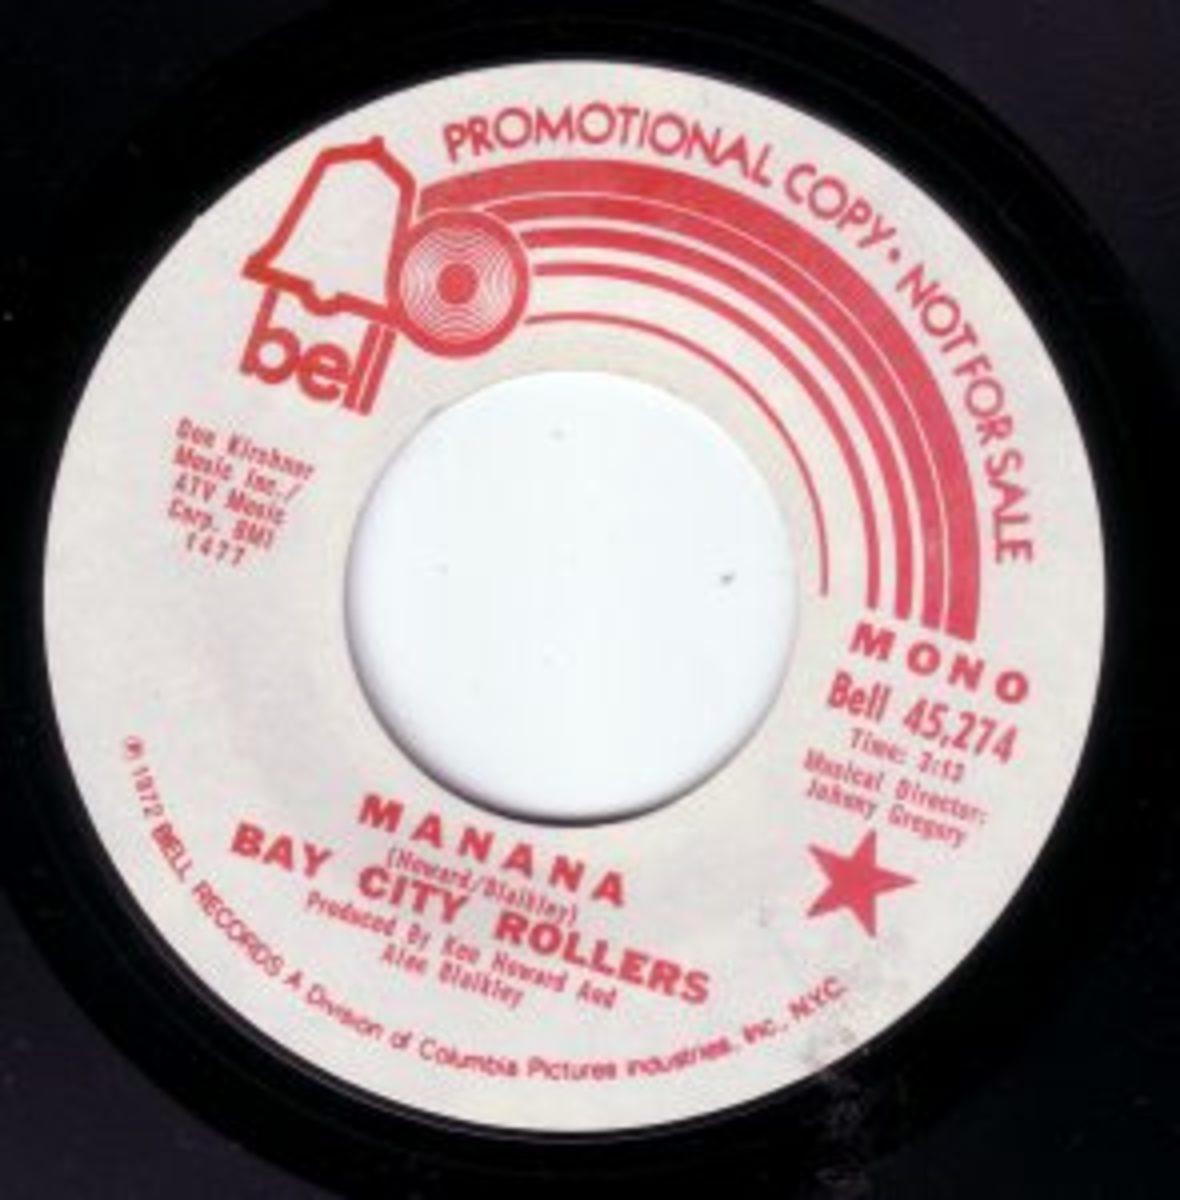 september-1972-bay-city-rollers